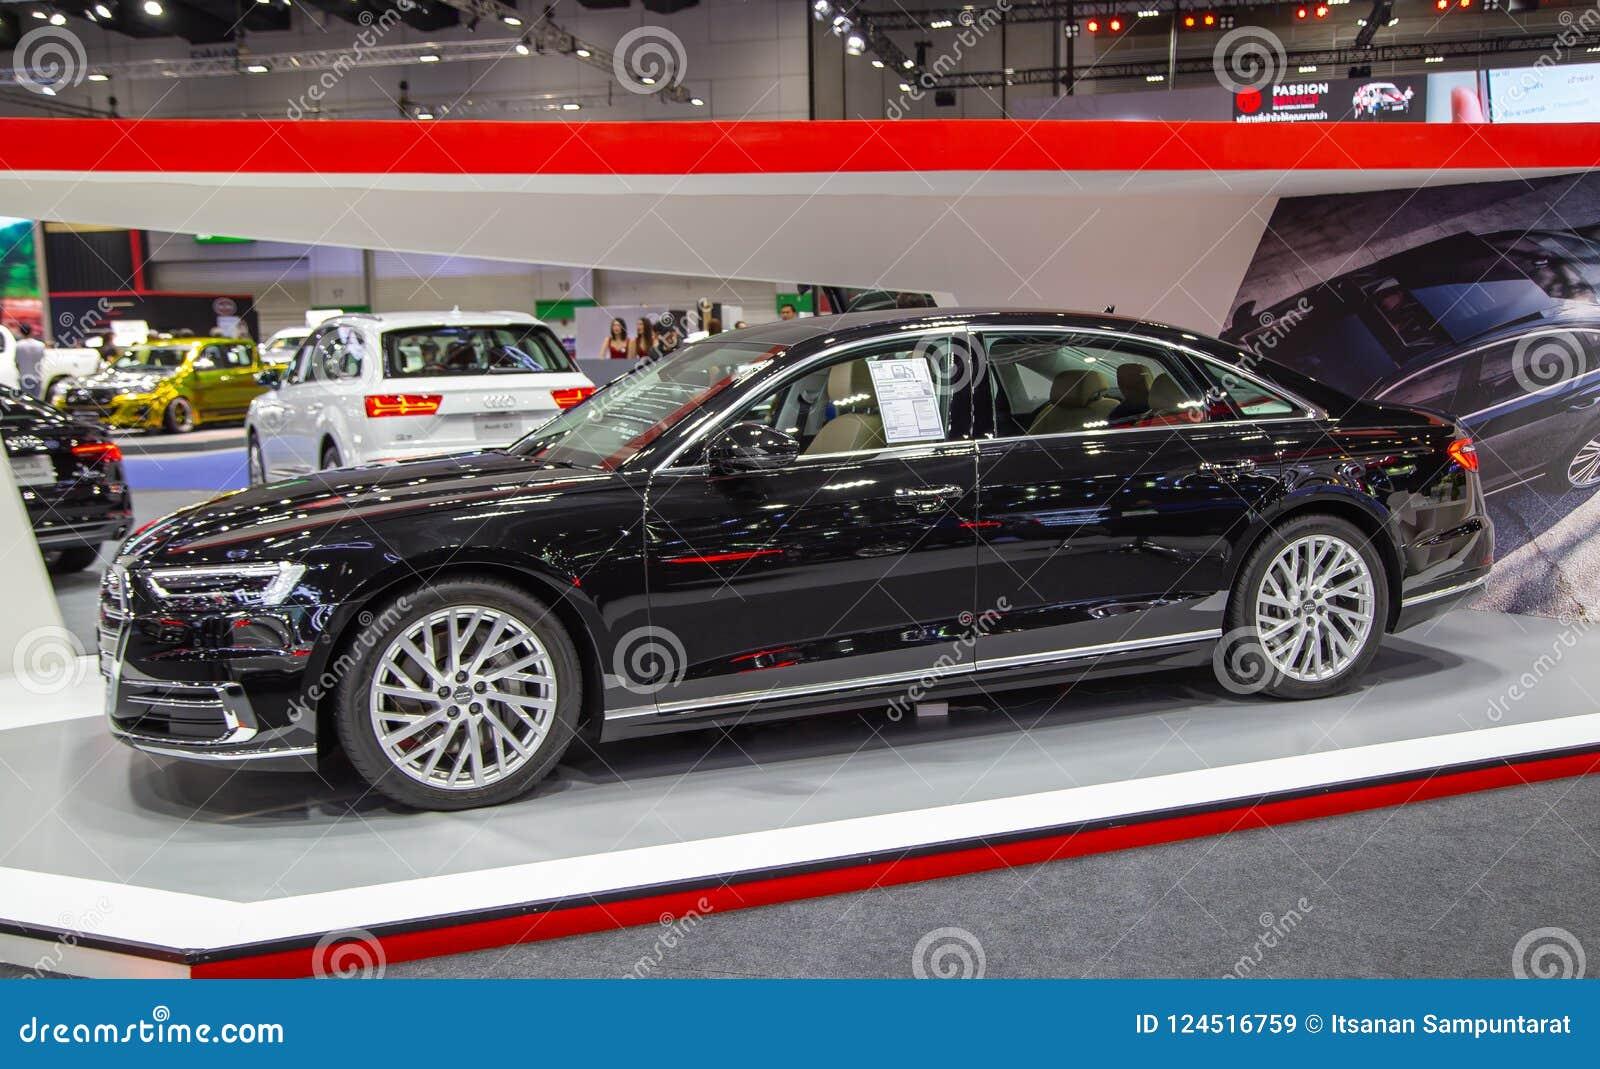 2019 Audi A8 Sedan editorial stock image  Image of event - 124516759